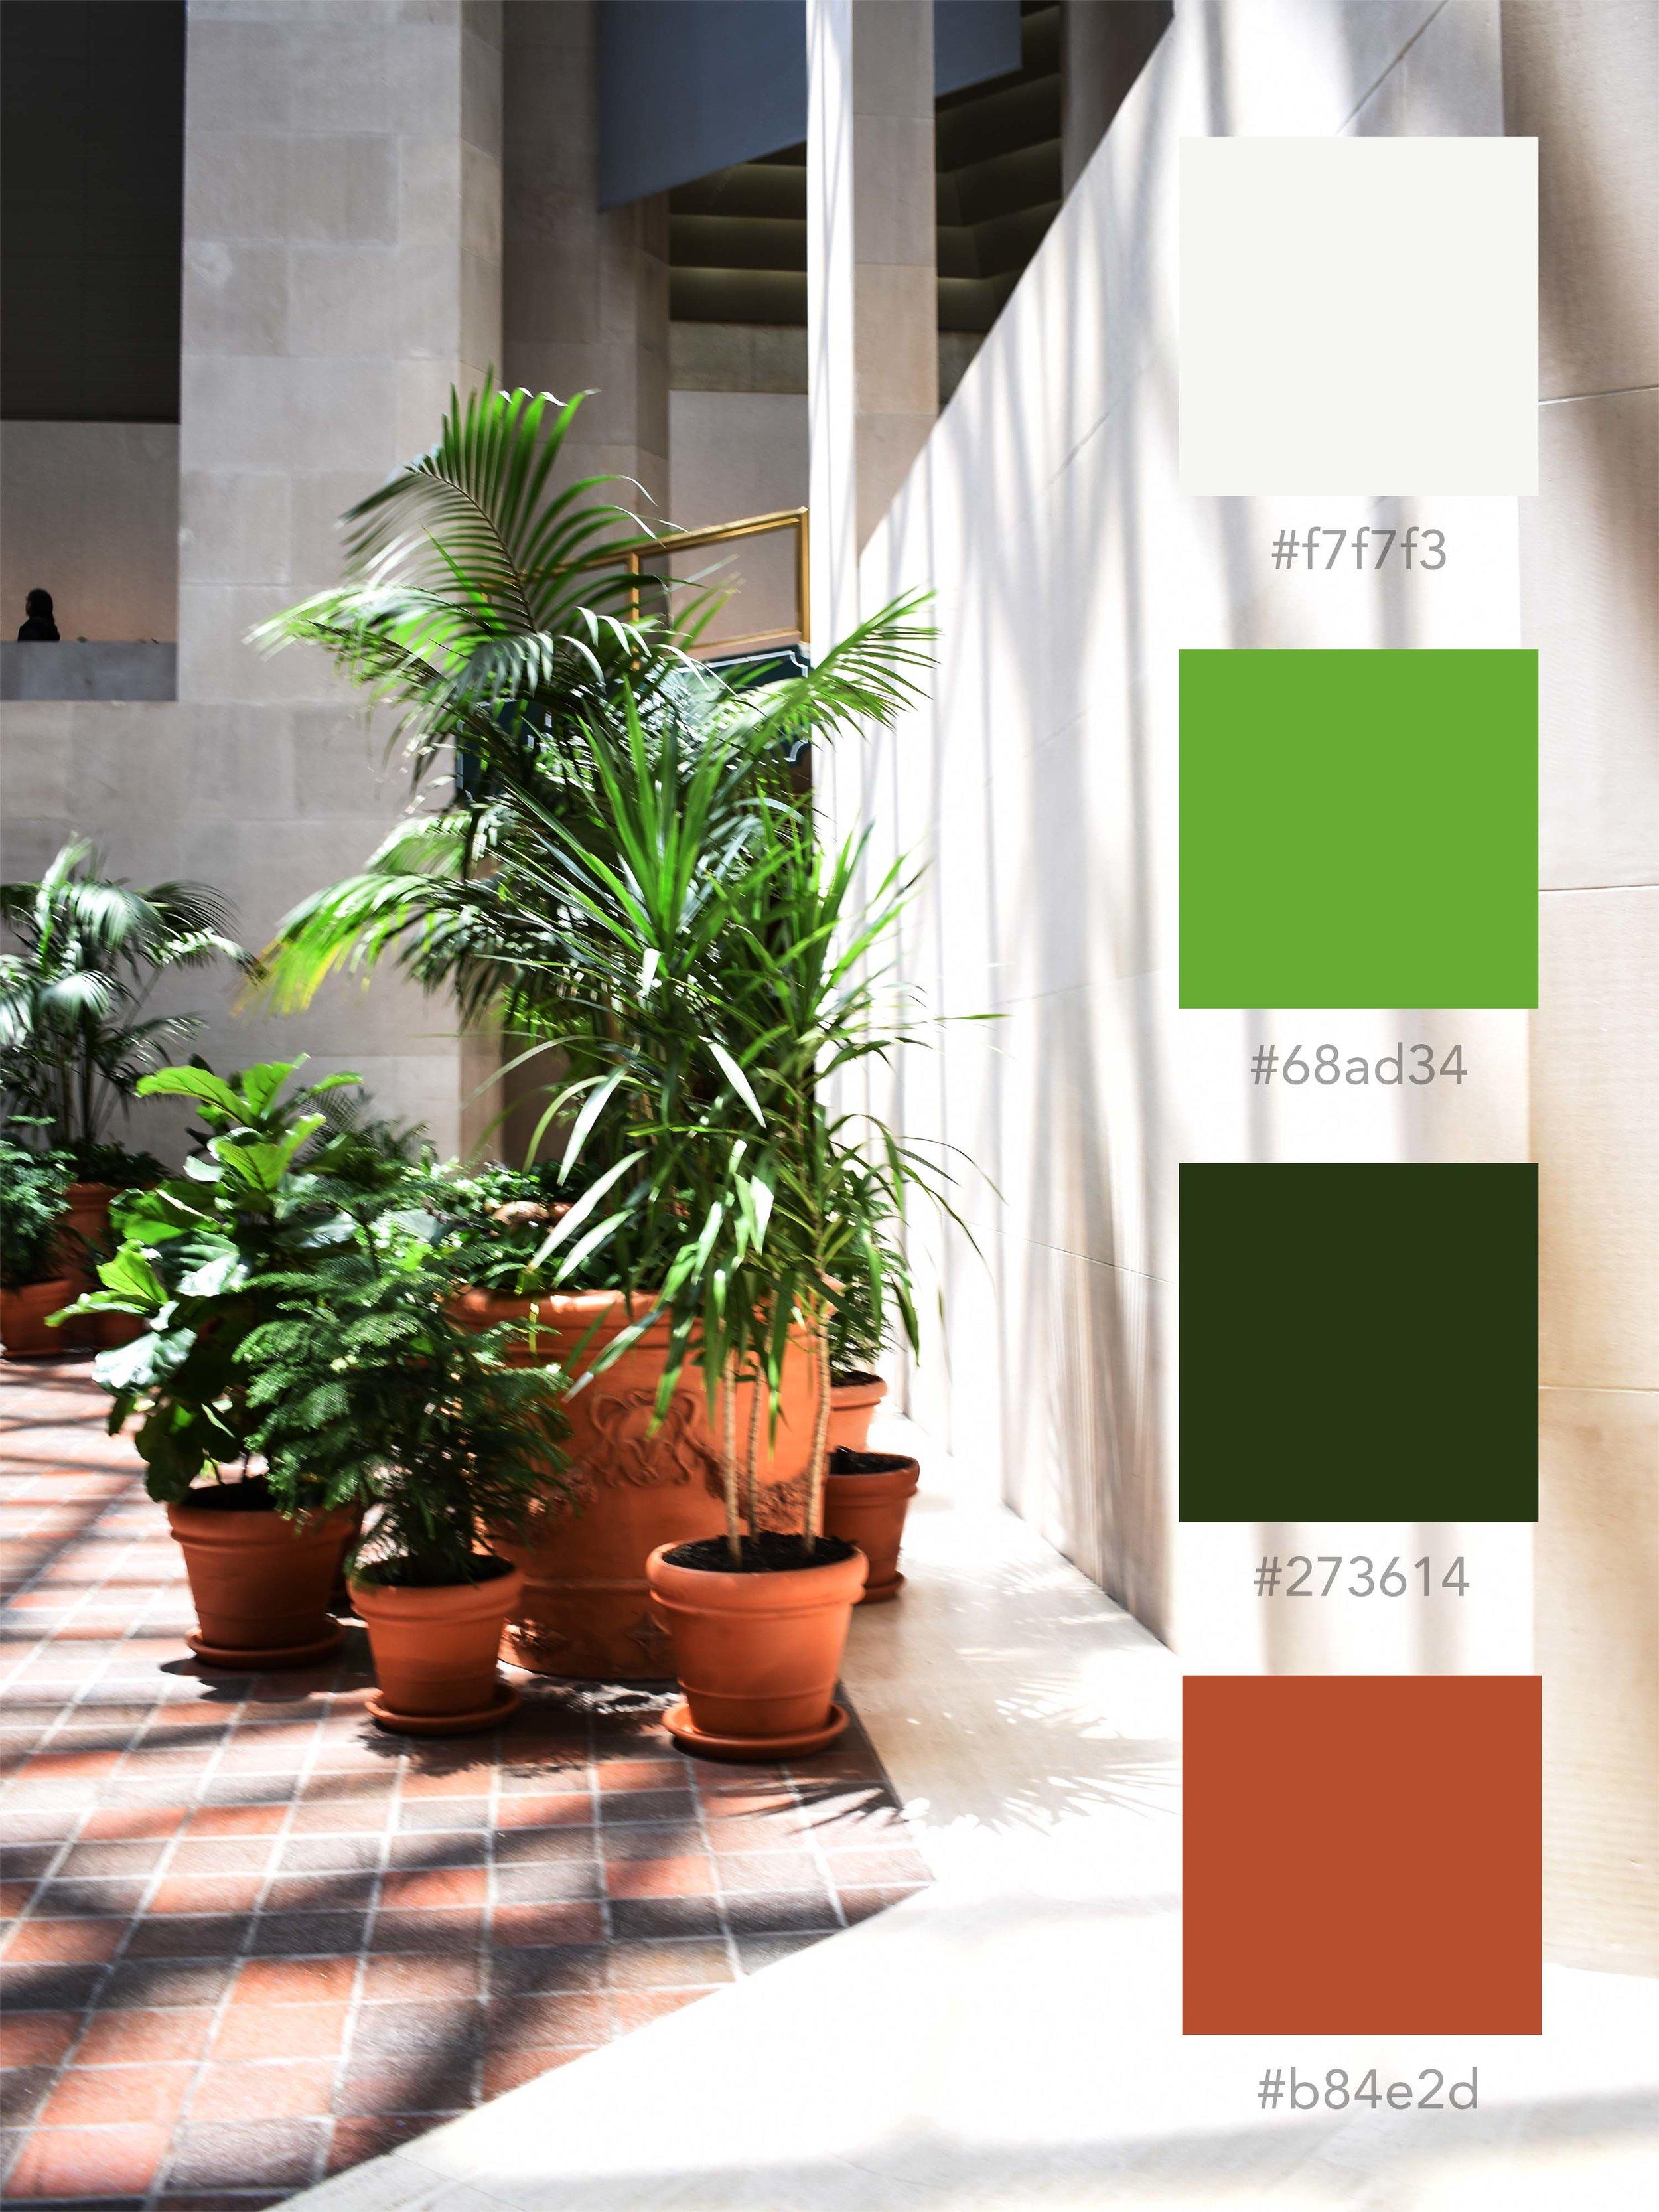 indoorplants_ct.jpg